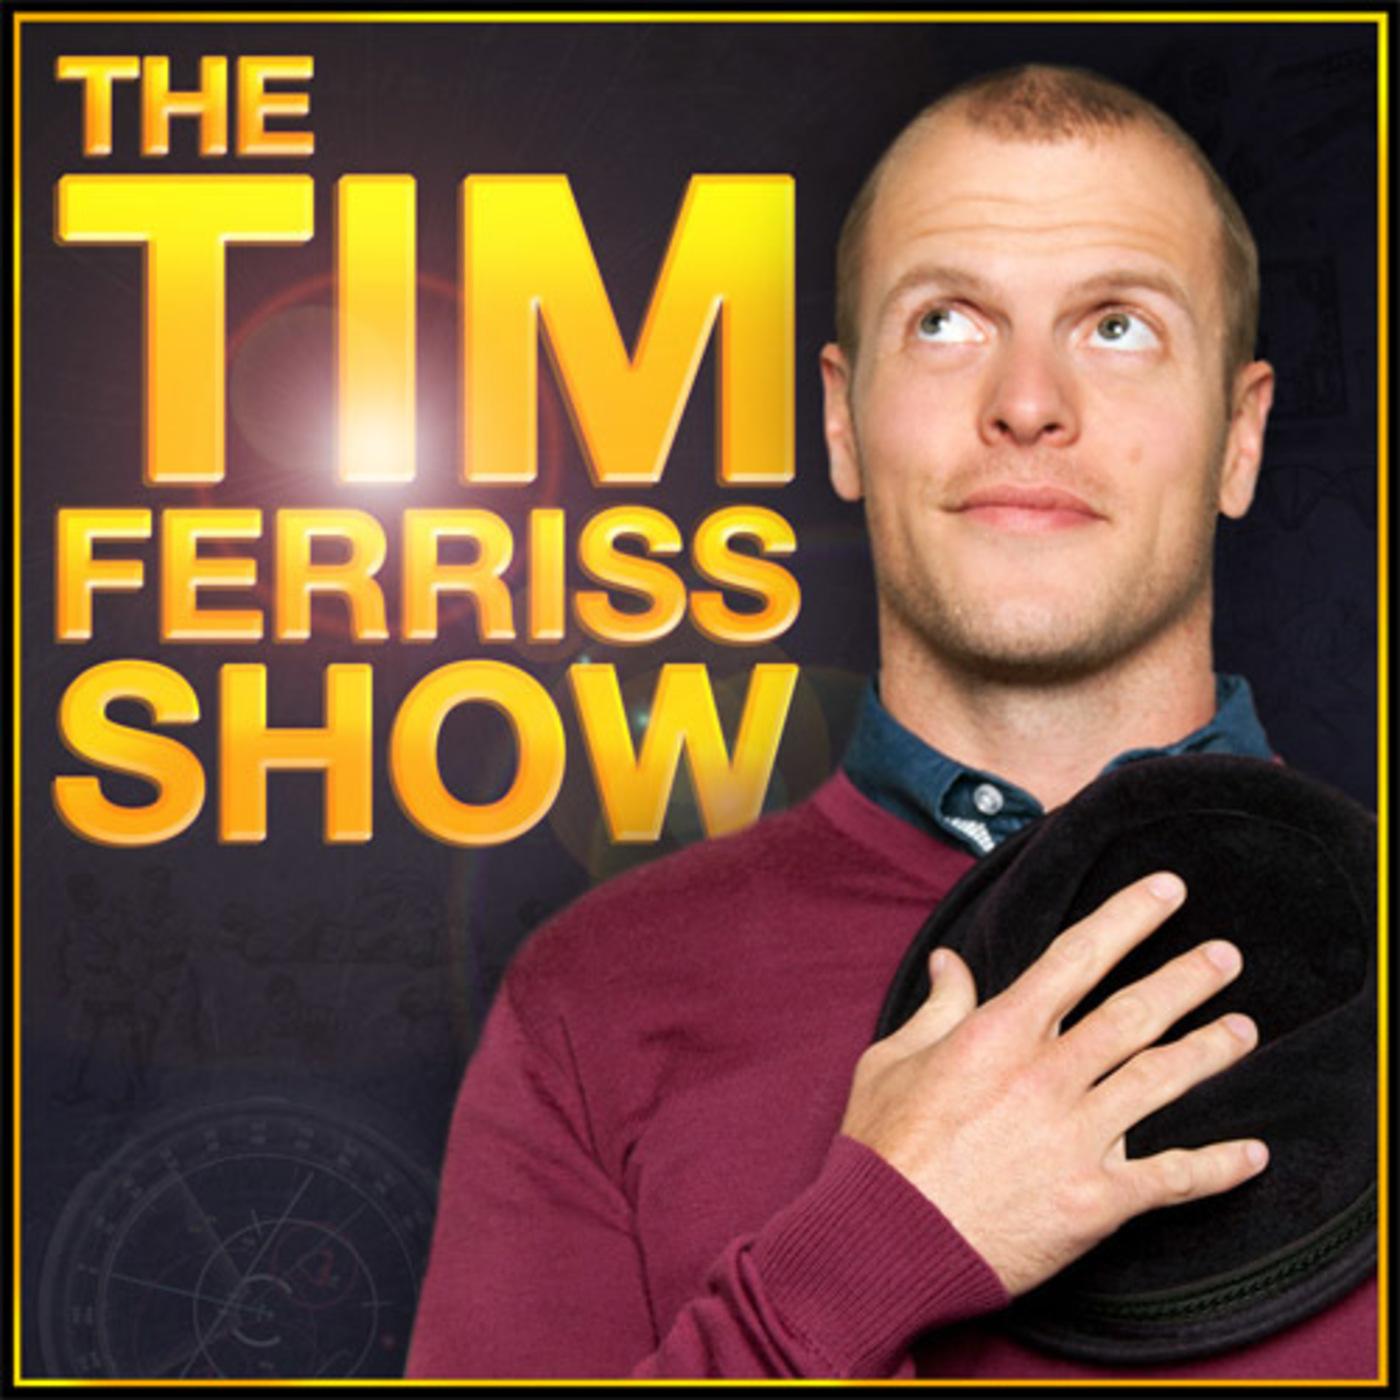 Episode 7: Stephen Dubner, co-author of Freakonomics